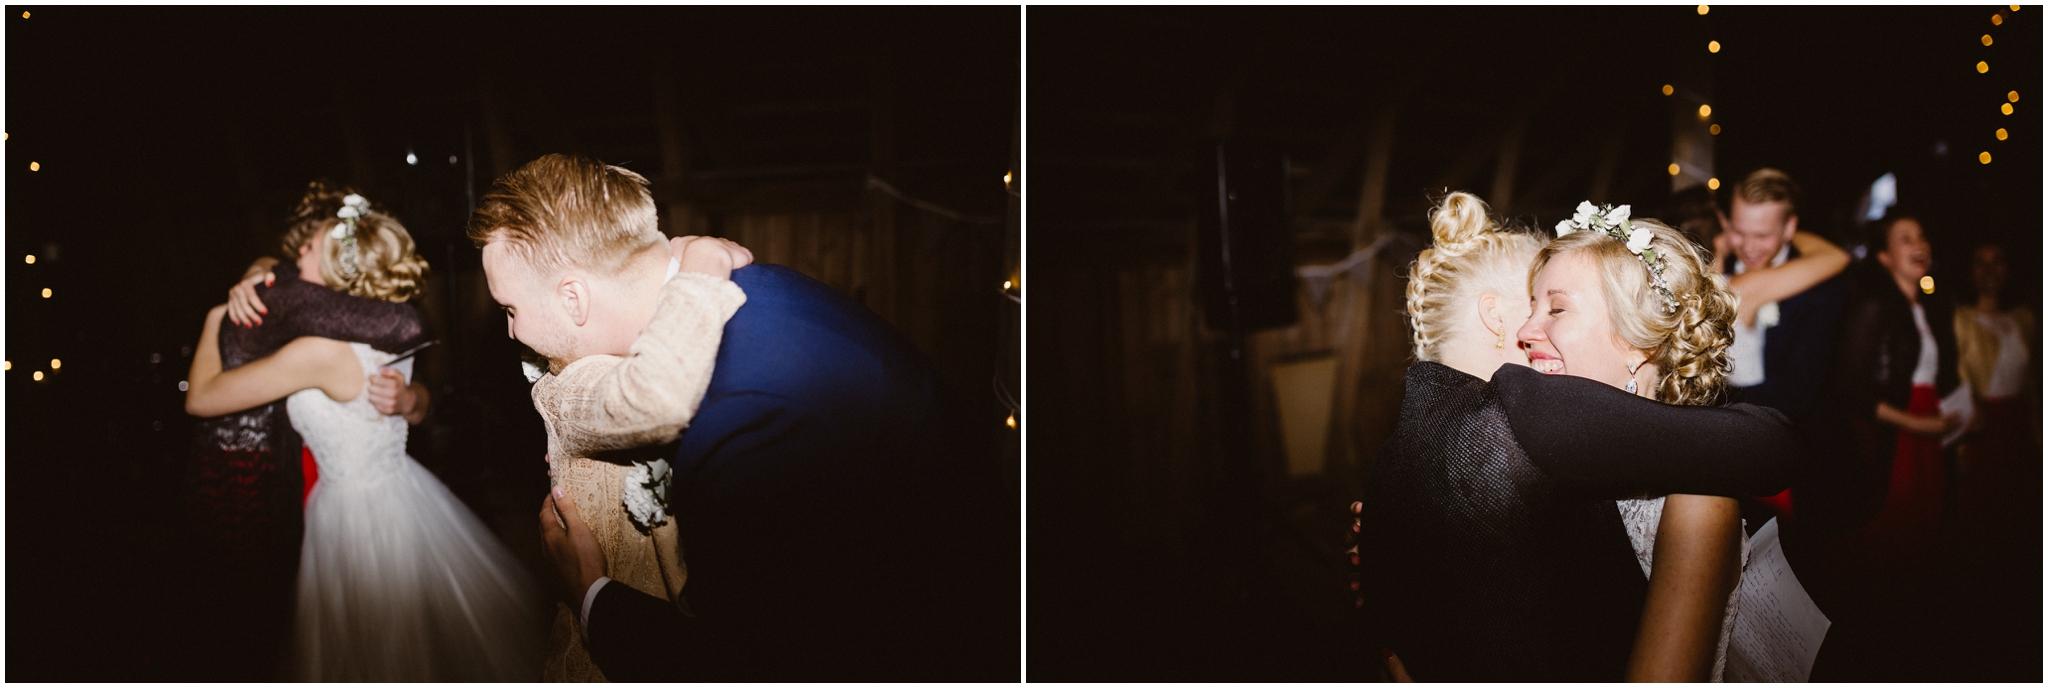 Leevi + Susanna -- Patrick Karkkolainen Wedding Photographer + Adventurer-201.jpg